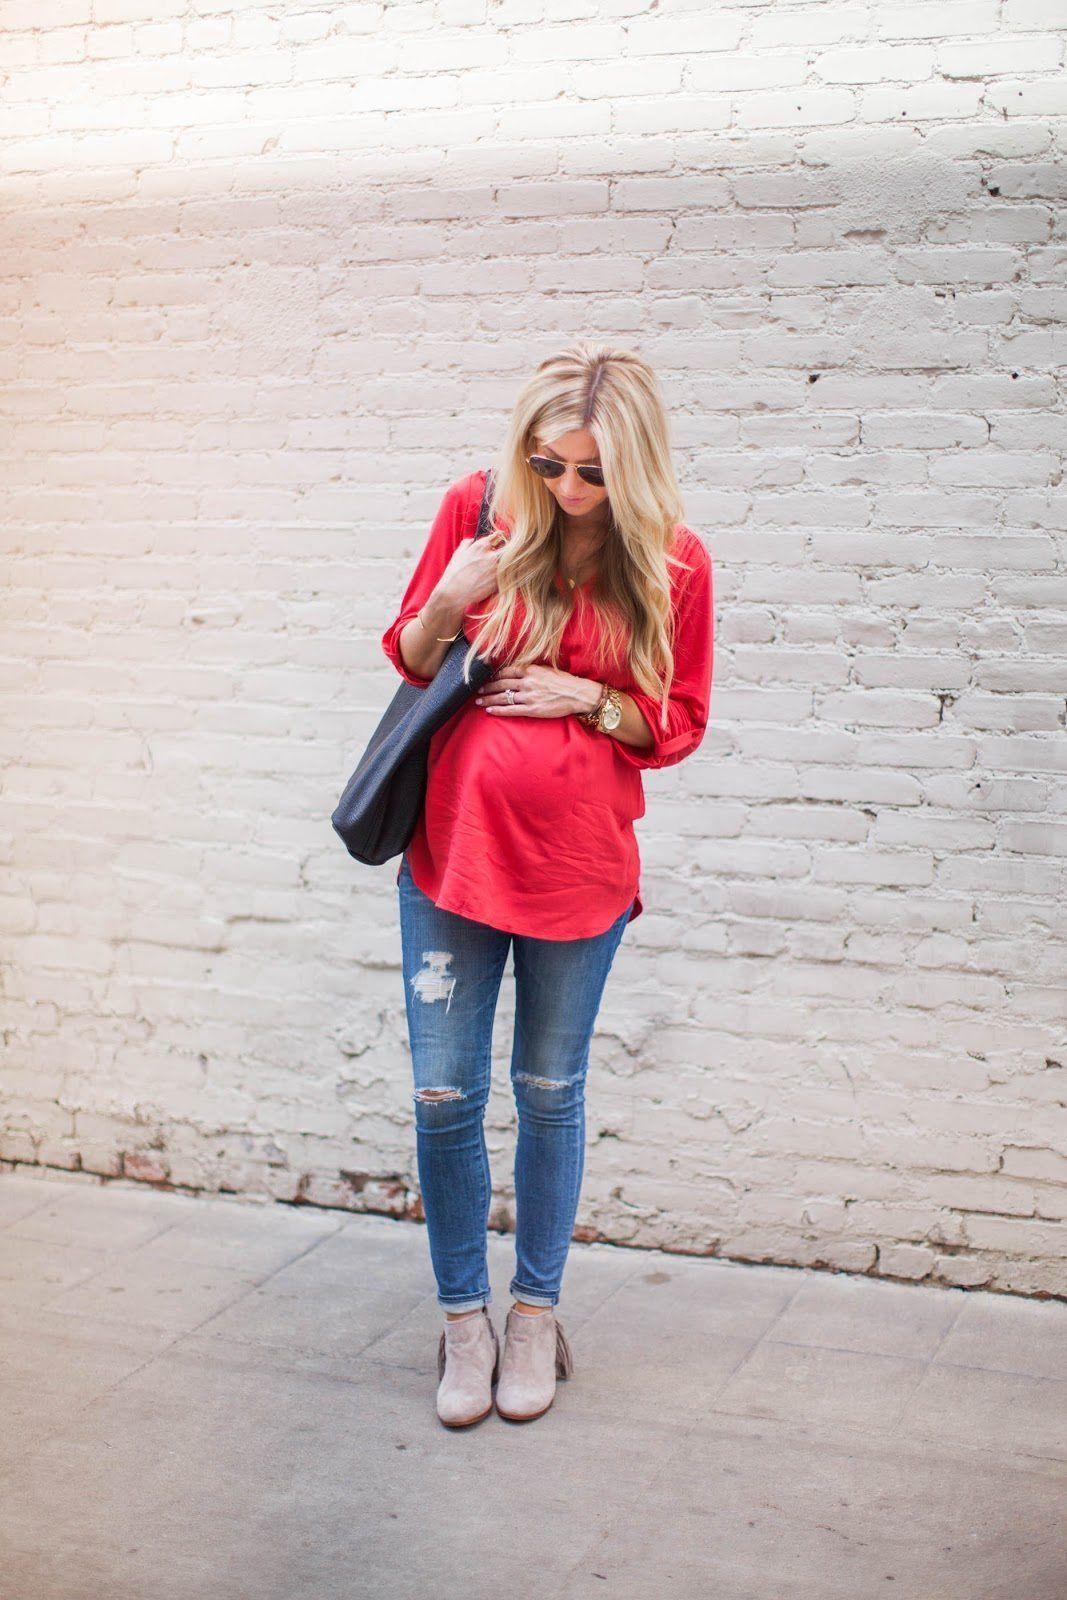 10655246a63a0 ON THE FRINGE Pregnancy Wardrobe, Pregnancy Fashion, Pregnancy Style,  Maternity Fashion, Maternity